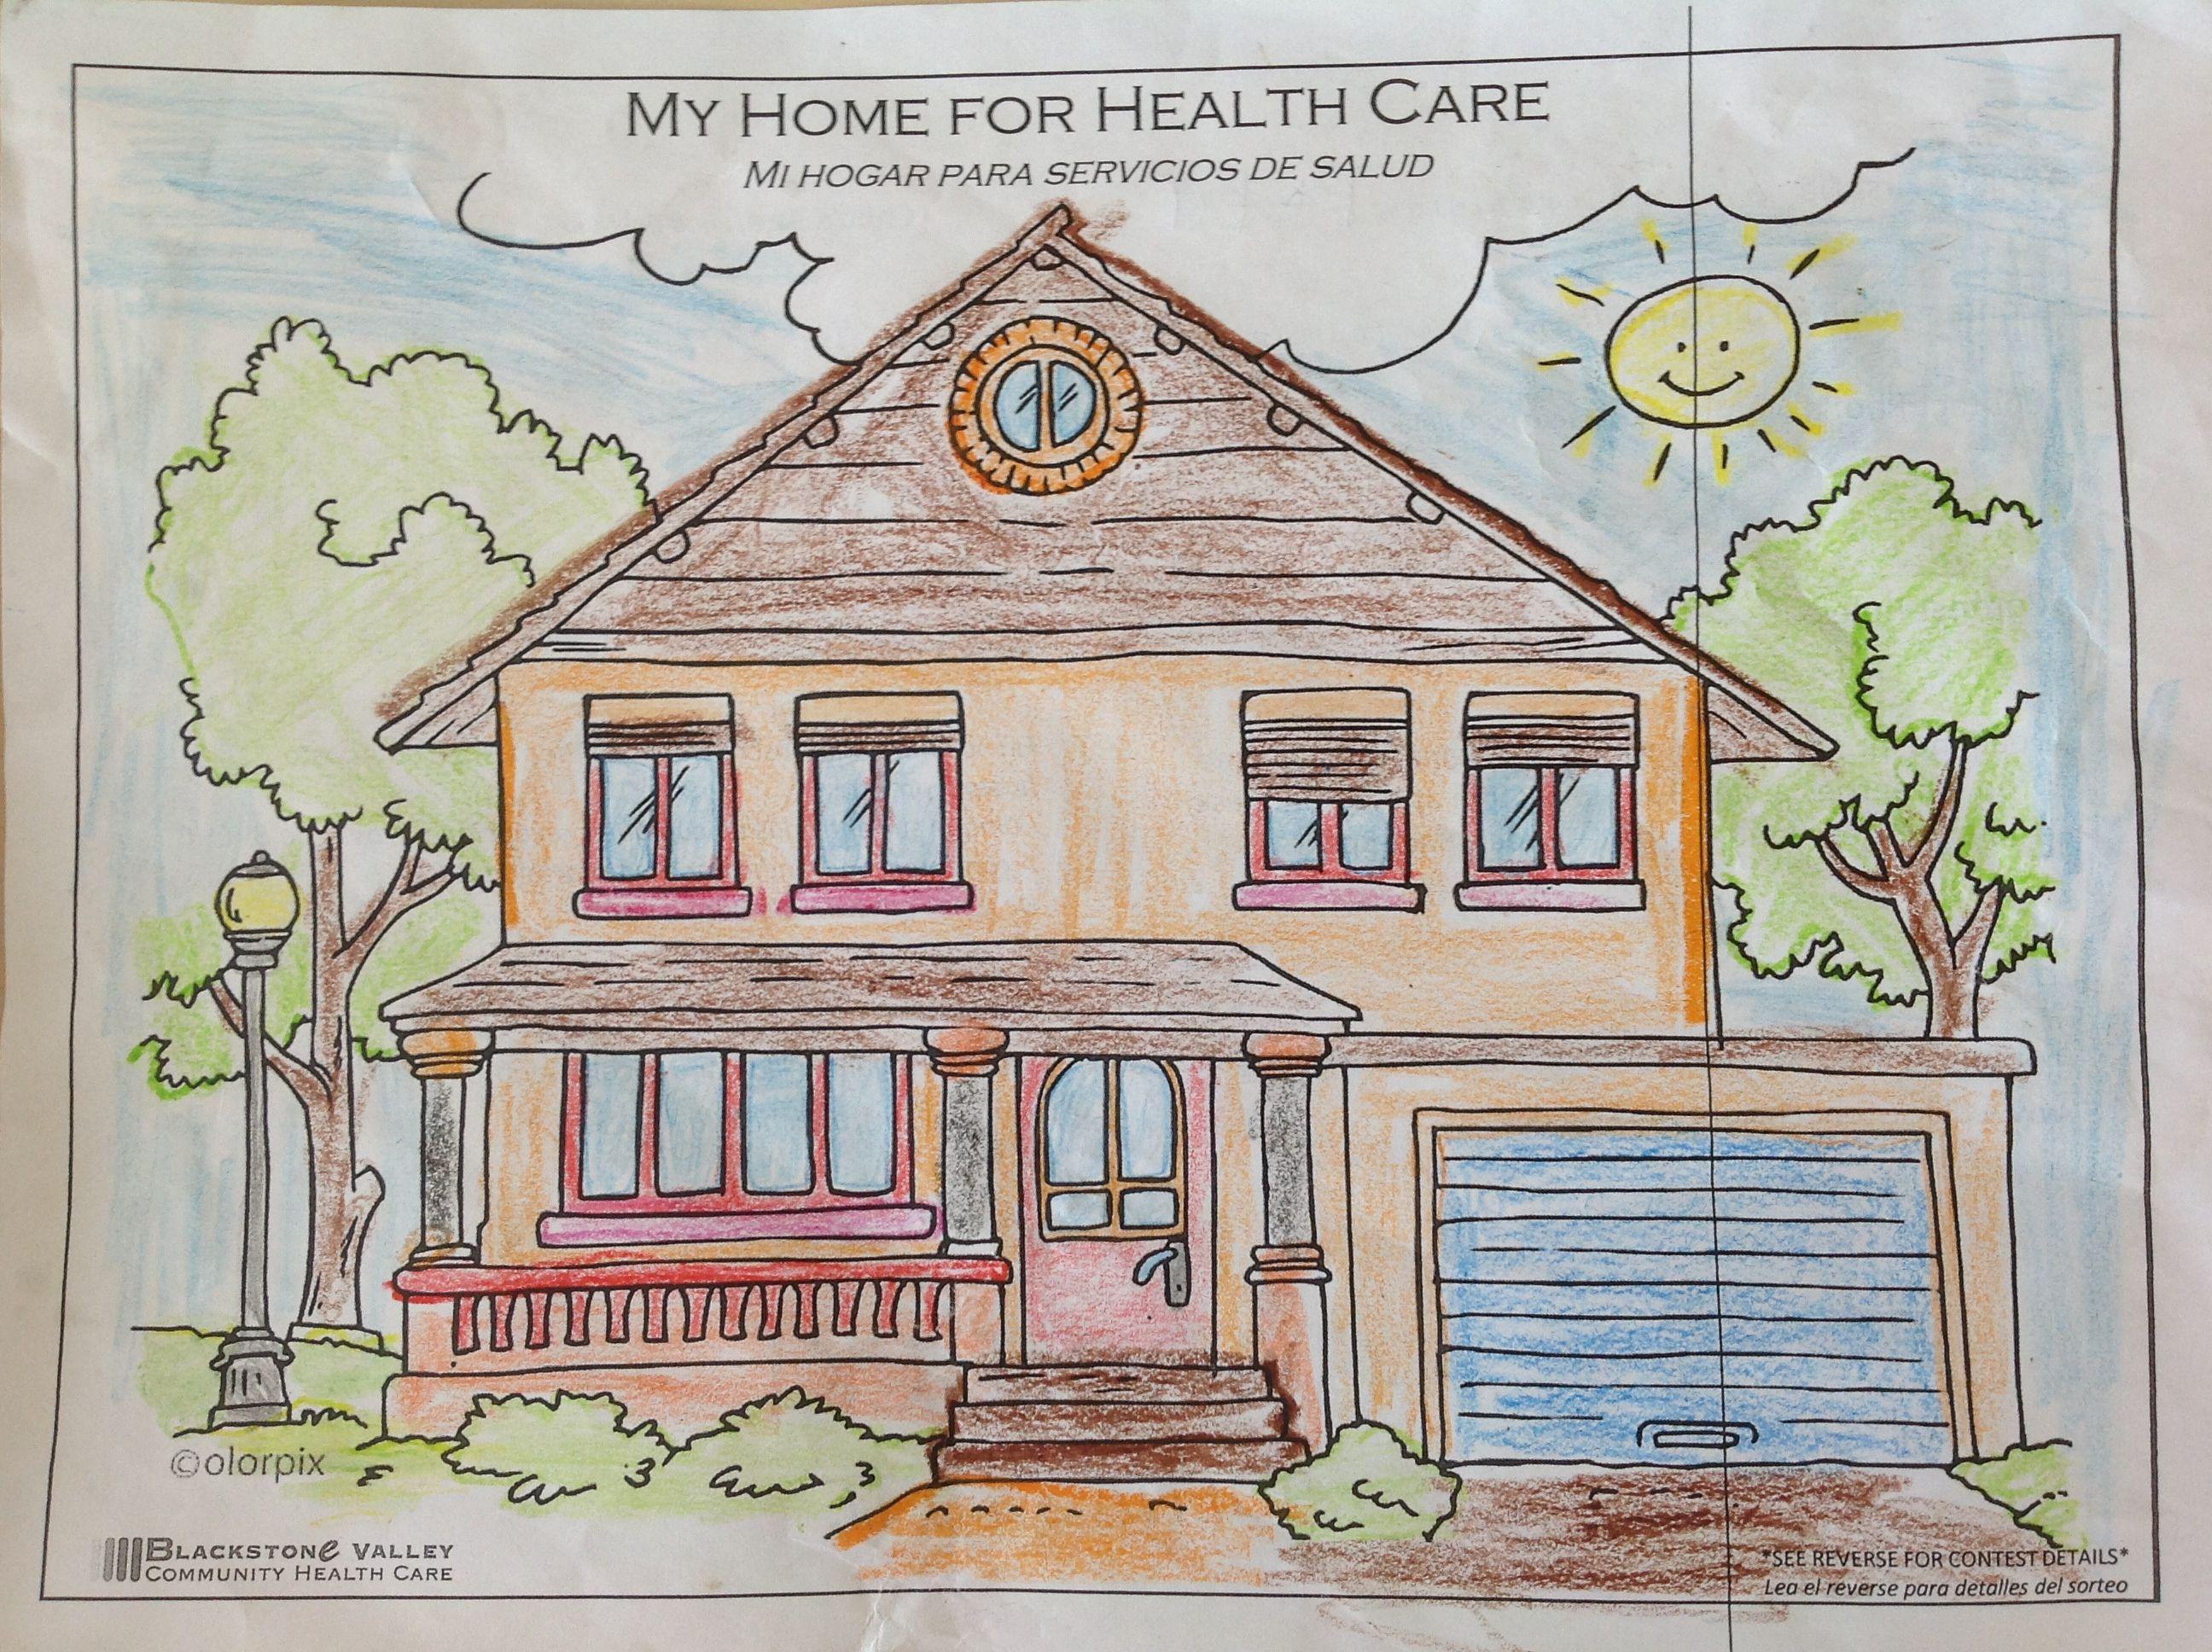 37+ Blackstone valley community health care central falls ideas in 2021